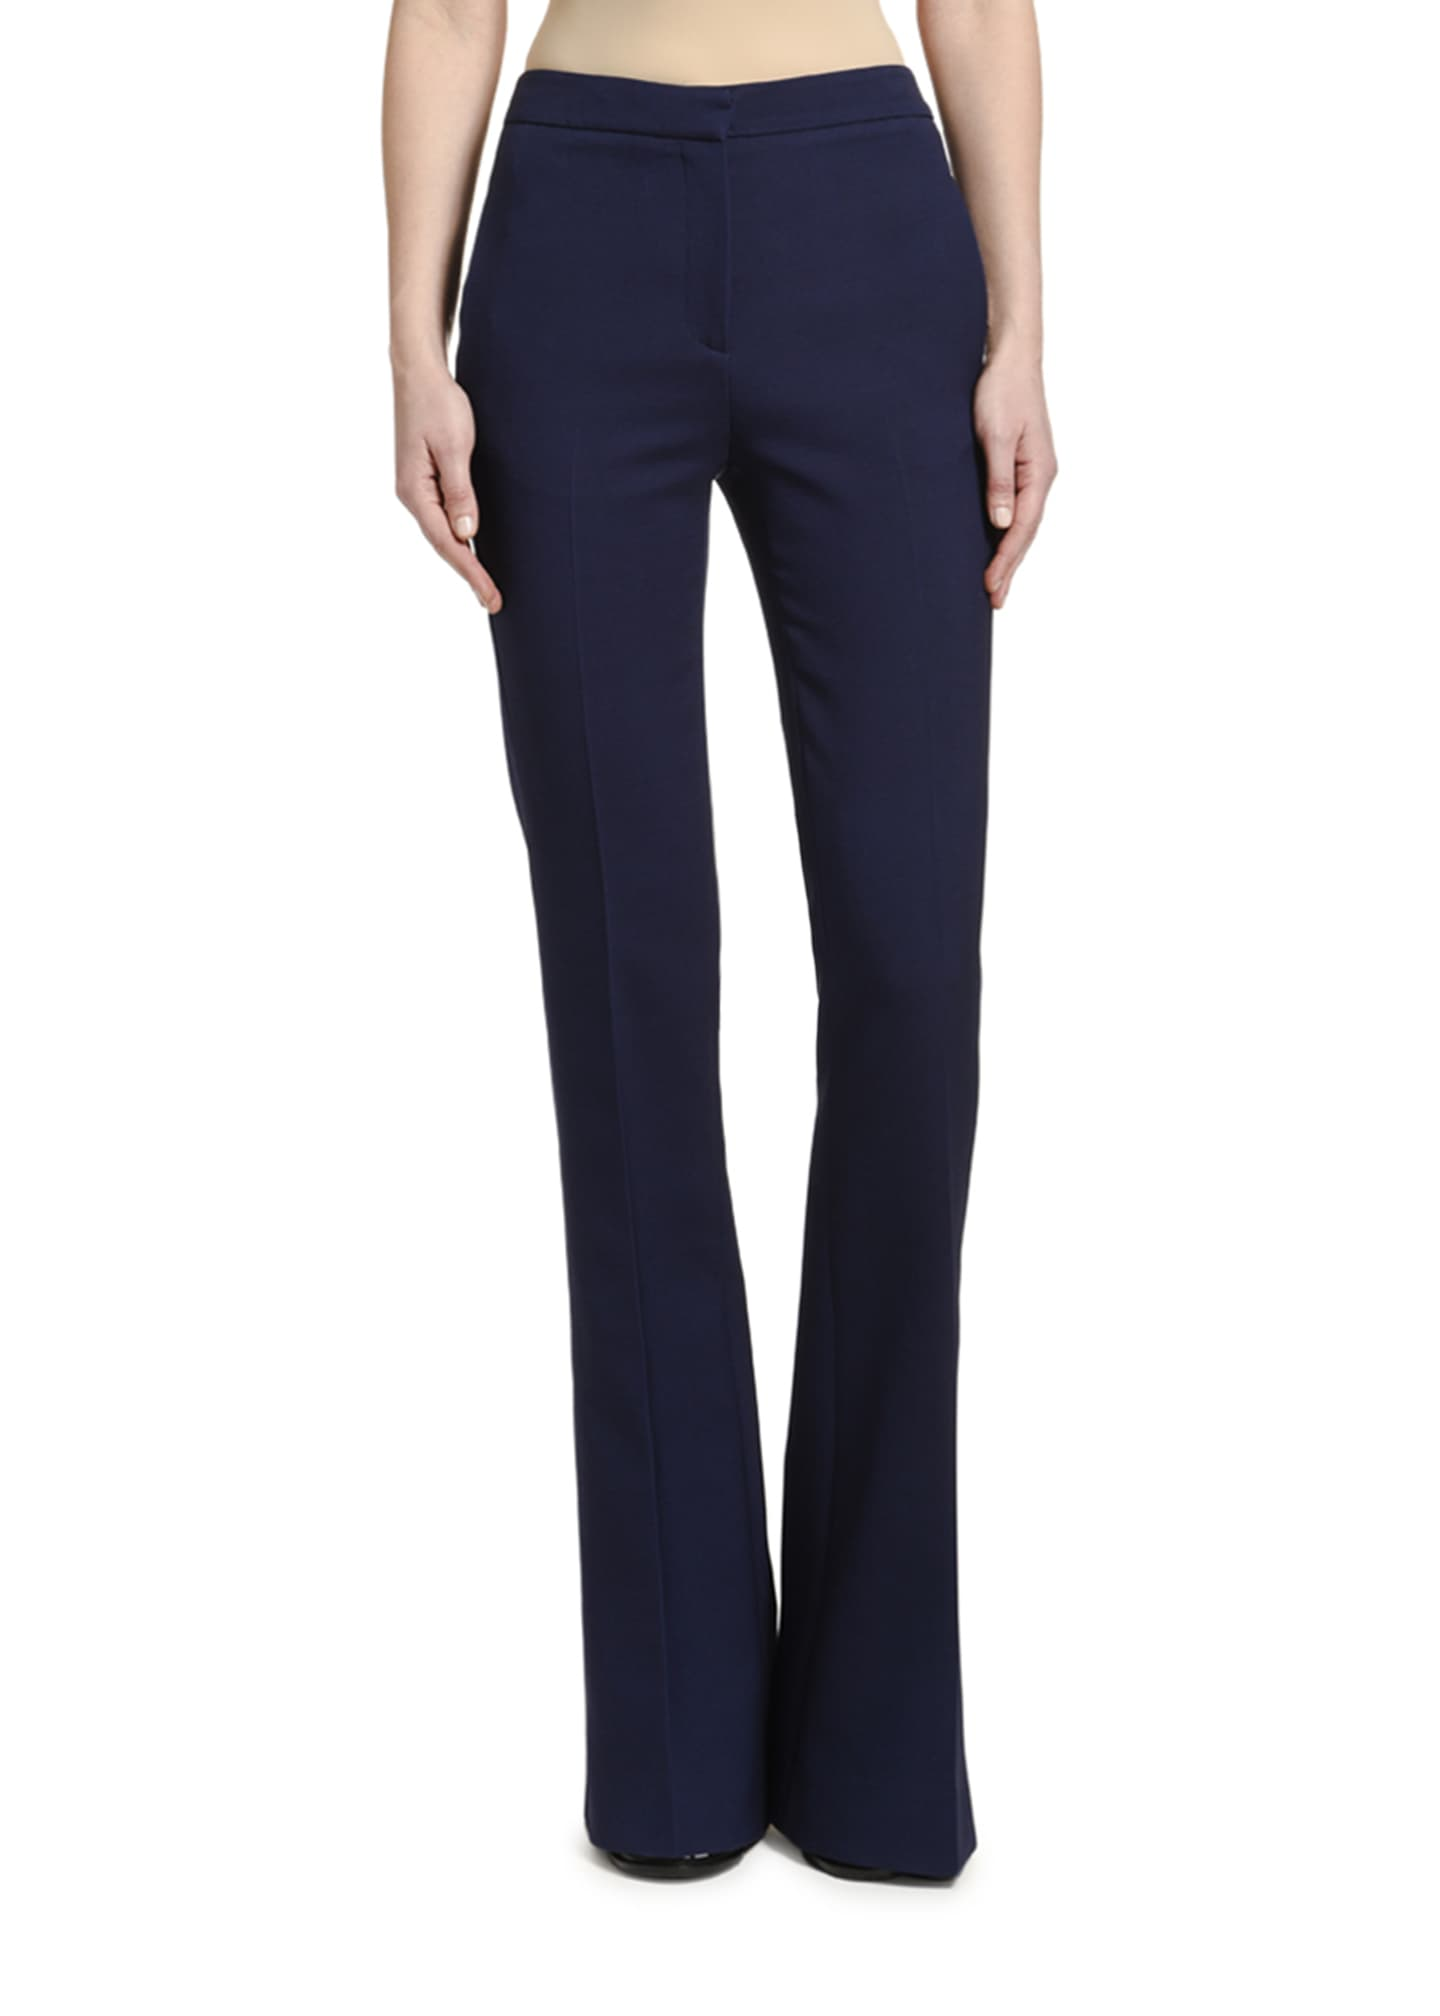 Tuxedo Flare Leg Jeans by Alexander Mc Queen